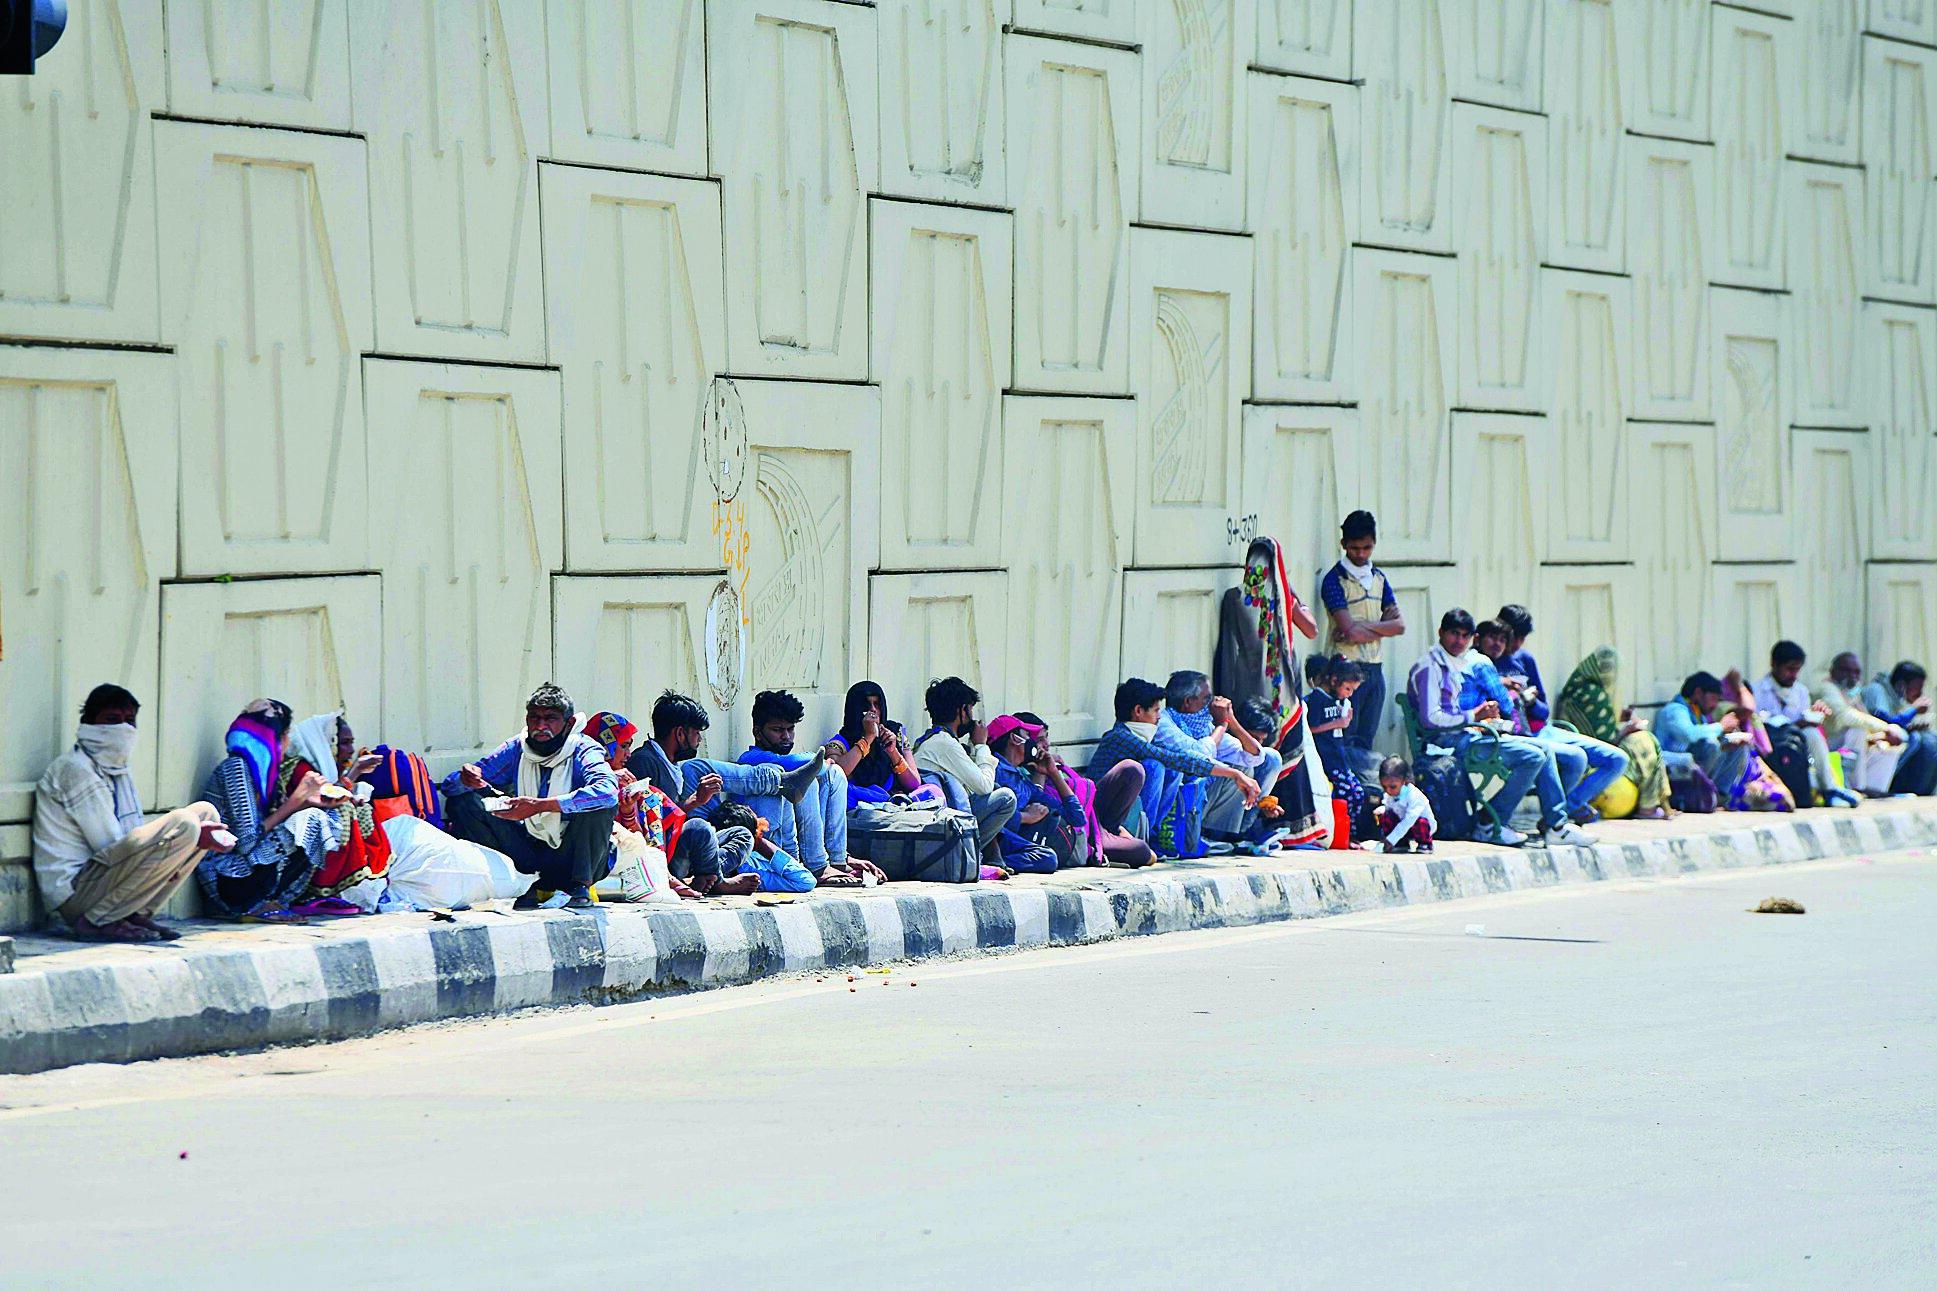 Migrants wait  on Wednesday at the Delhi-Uttar Pradesh border for transport to reach home.